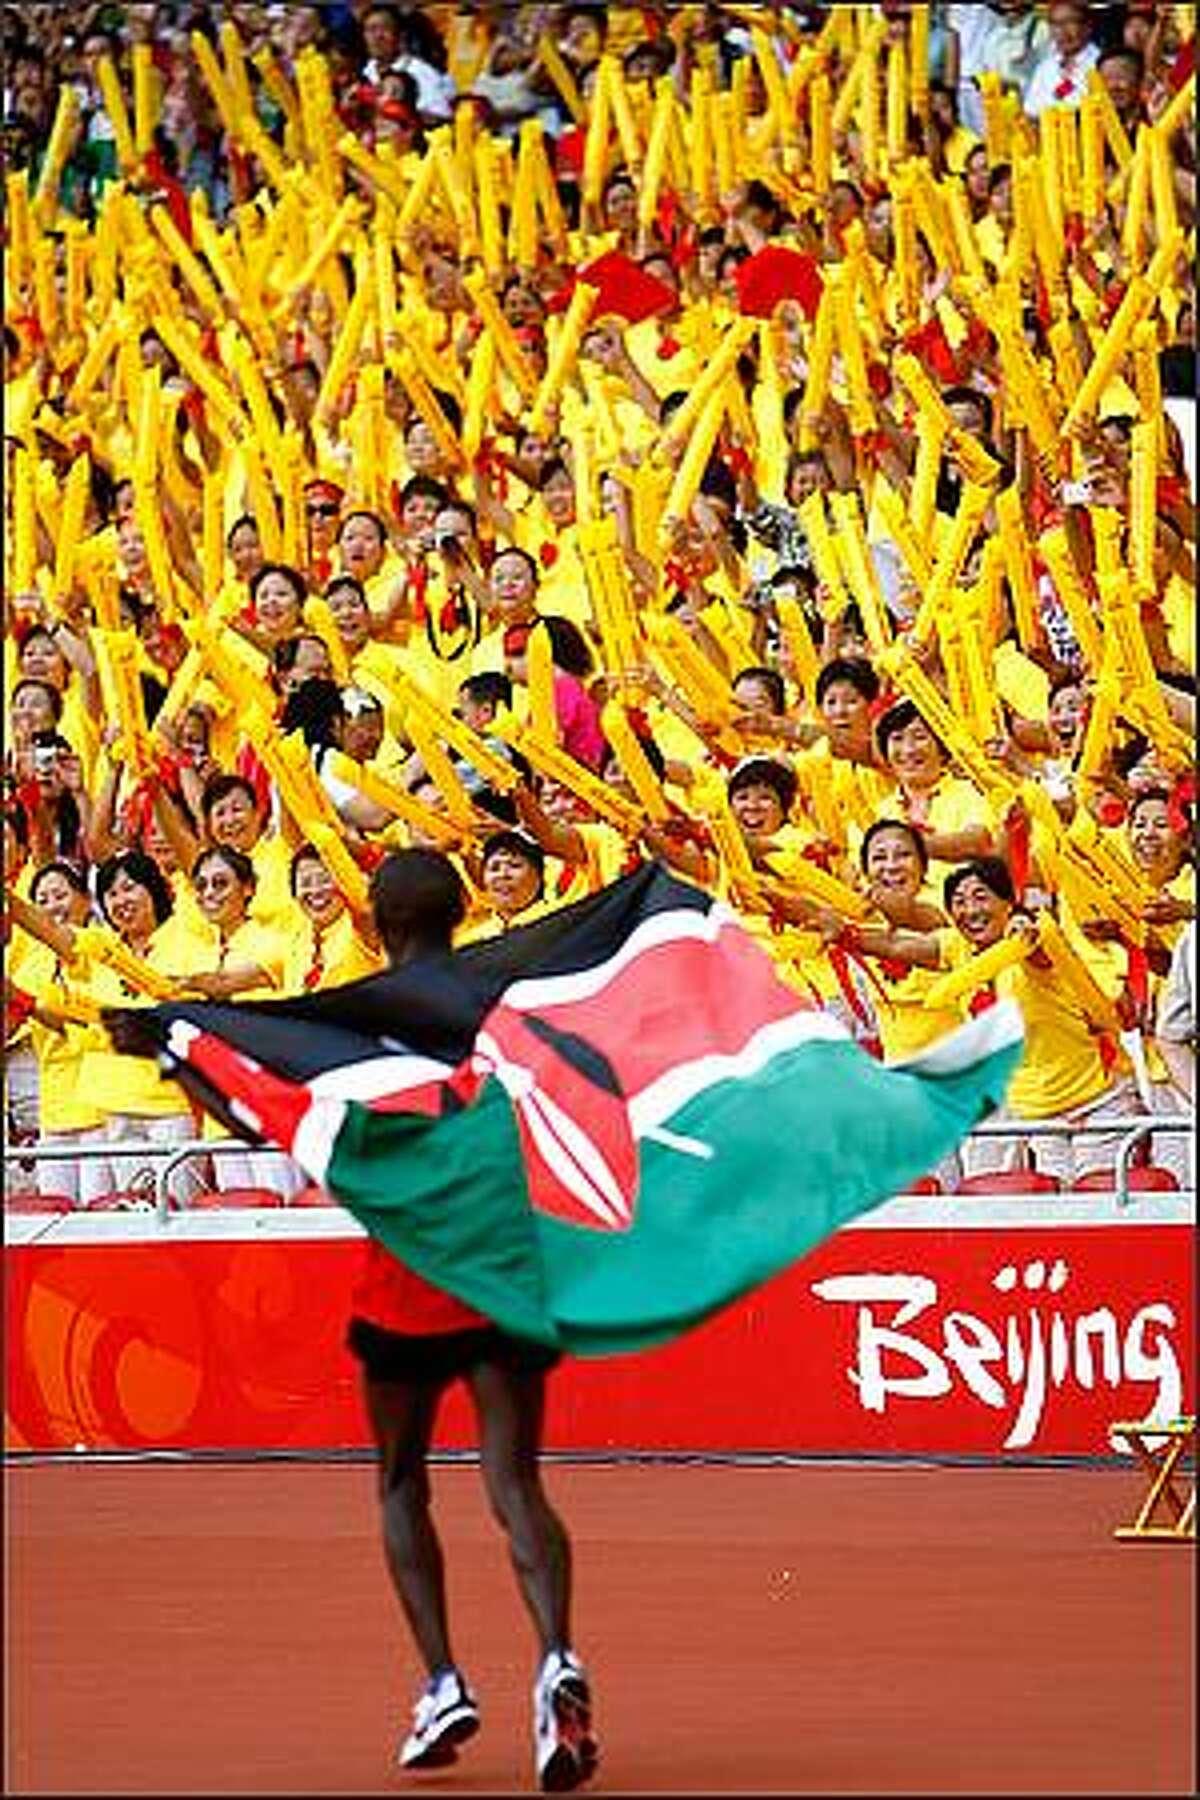 Samuel Kamau Wansiru of Kenya celebrates after winning the Men's Marathon in the National Stadium during Day 16 of the Beijing 2008 Olympic Games on Sunday in Beijing.